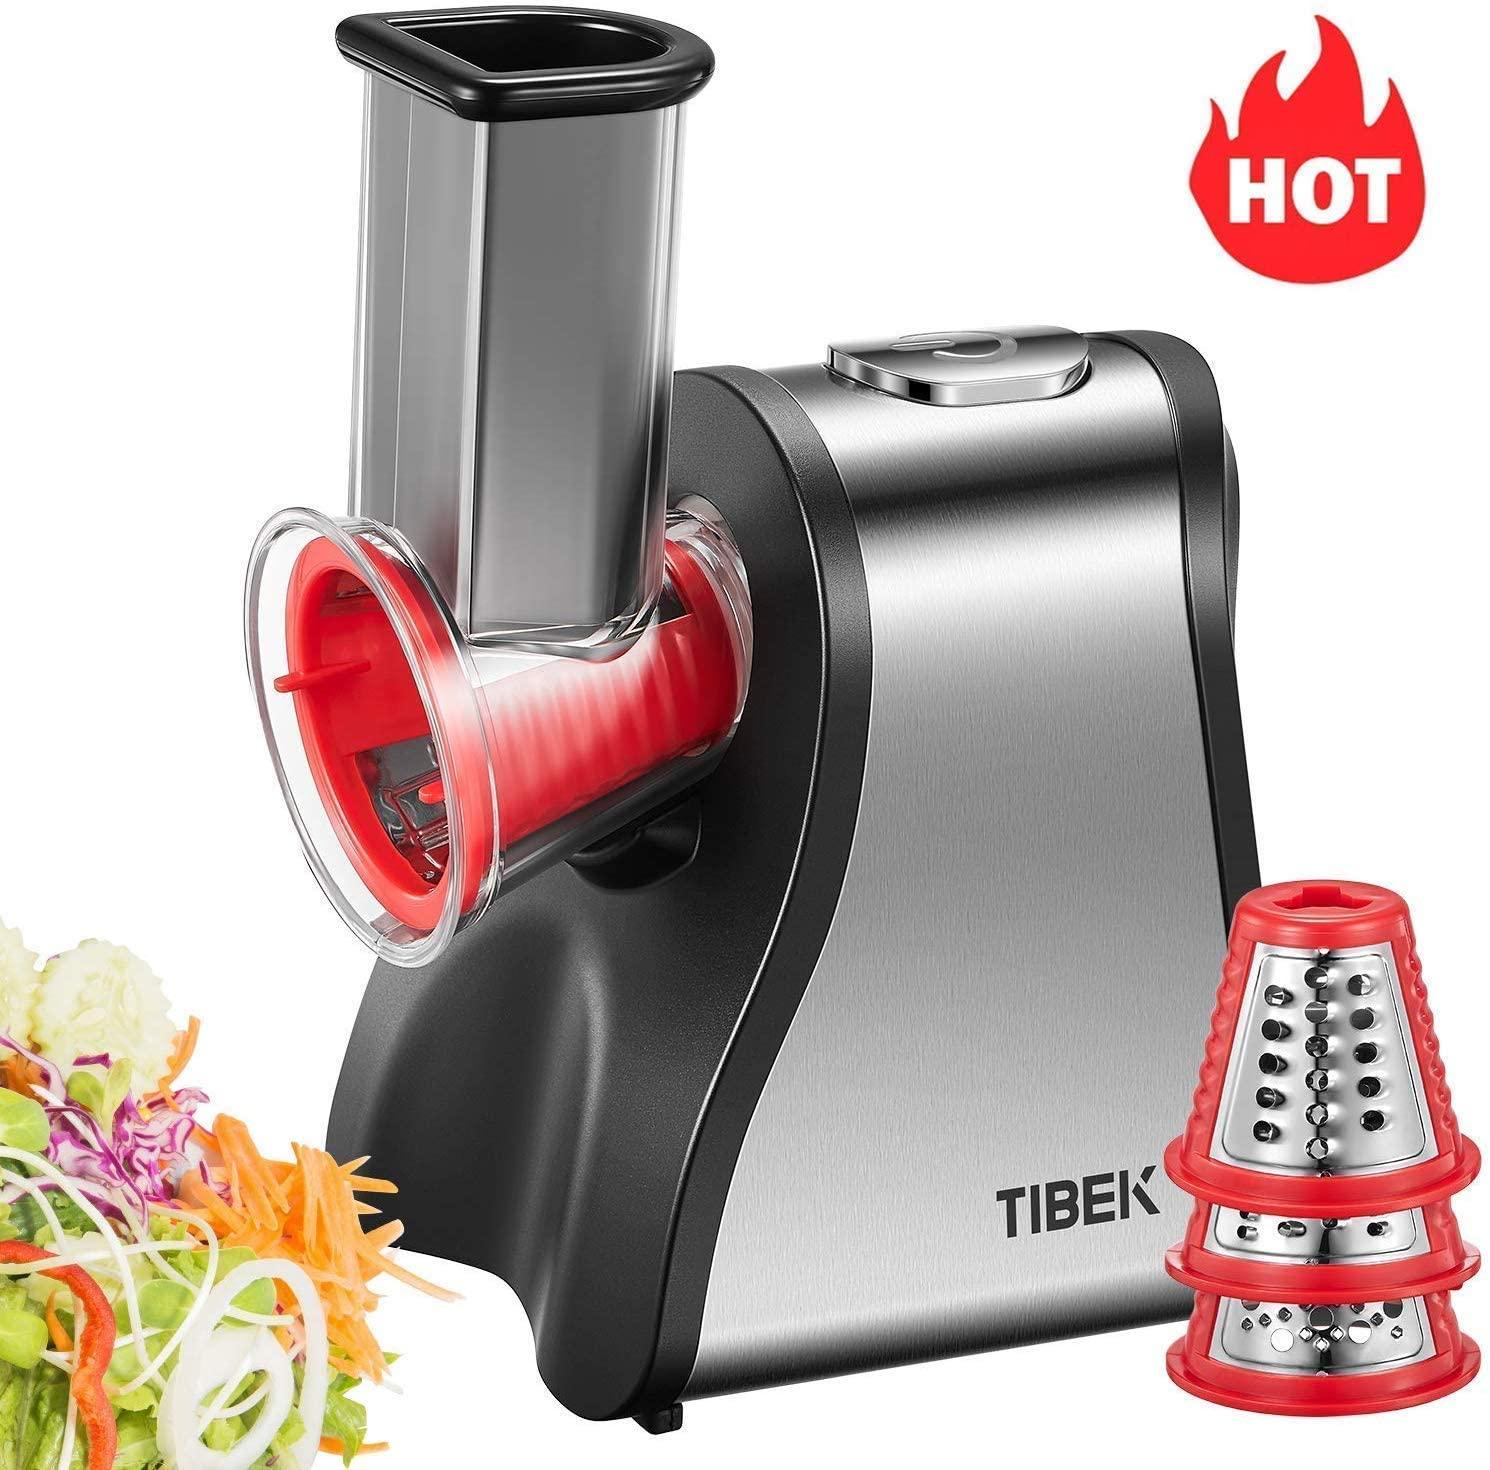 Tibek - Picadora eléctrica de cocina de 200 W